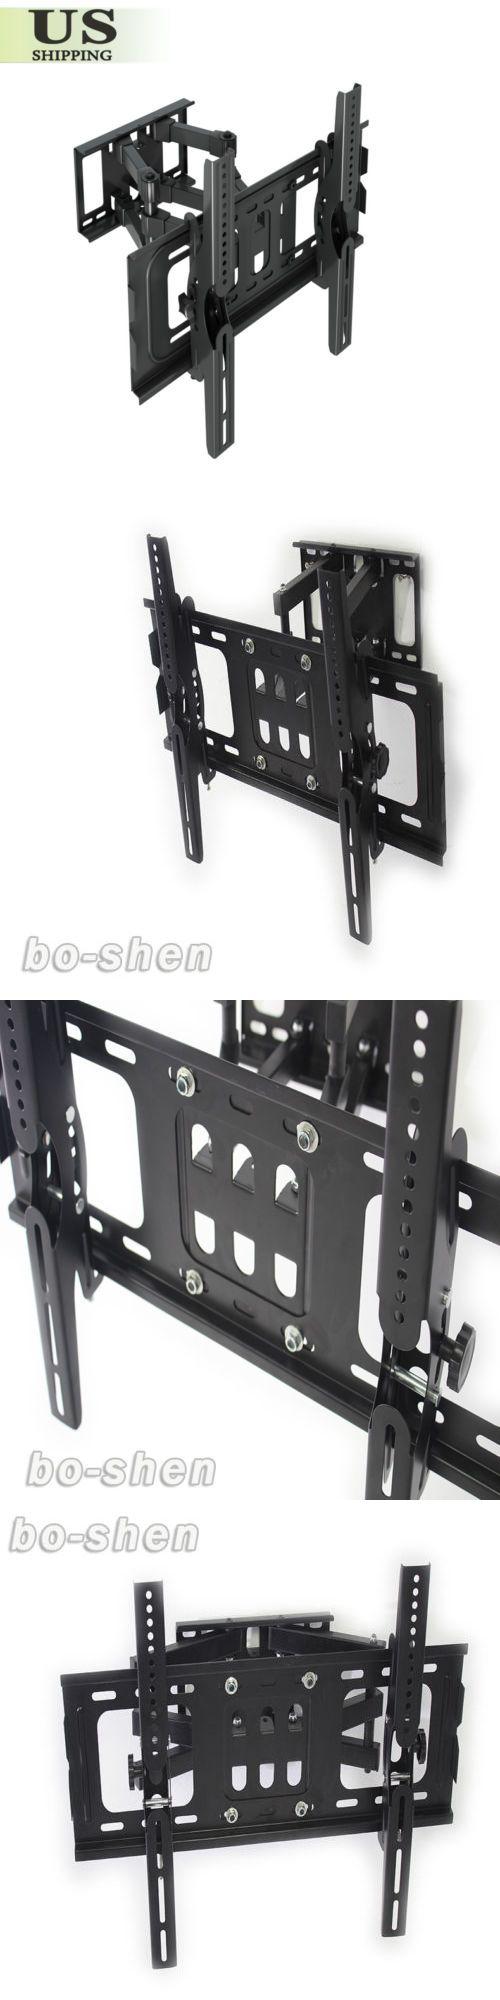 TV Mounts and Brackets: Dual Arm Tilt Swivel Articulating Lcd Led Plasma Tv Wall Mount Bracket 25 - 52 -> BUY IT NOW ONLY: $32.98 on eBay!